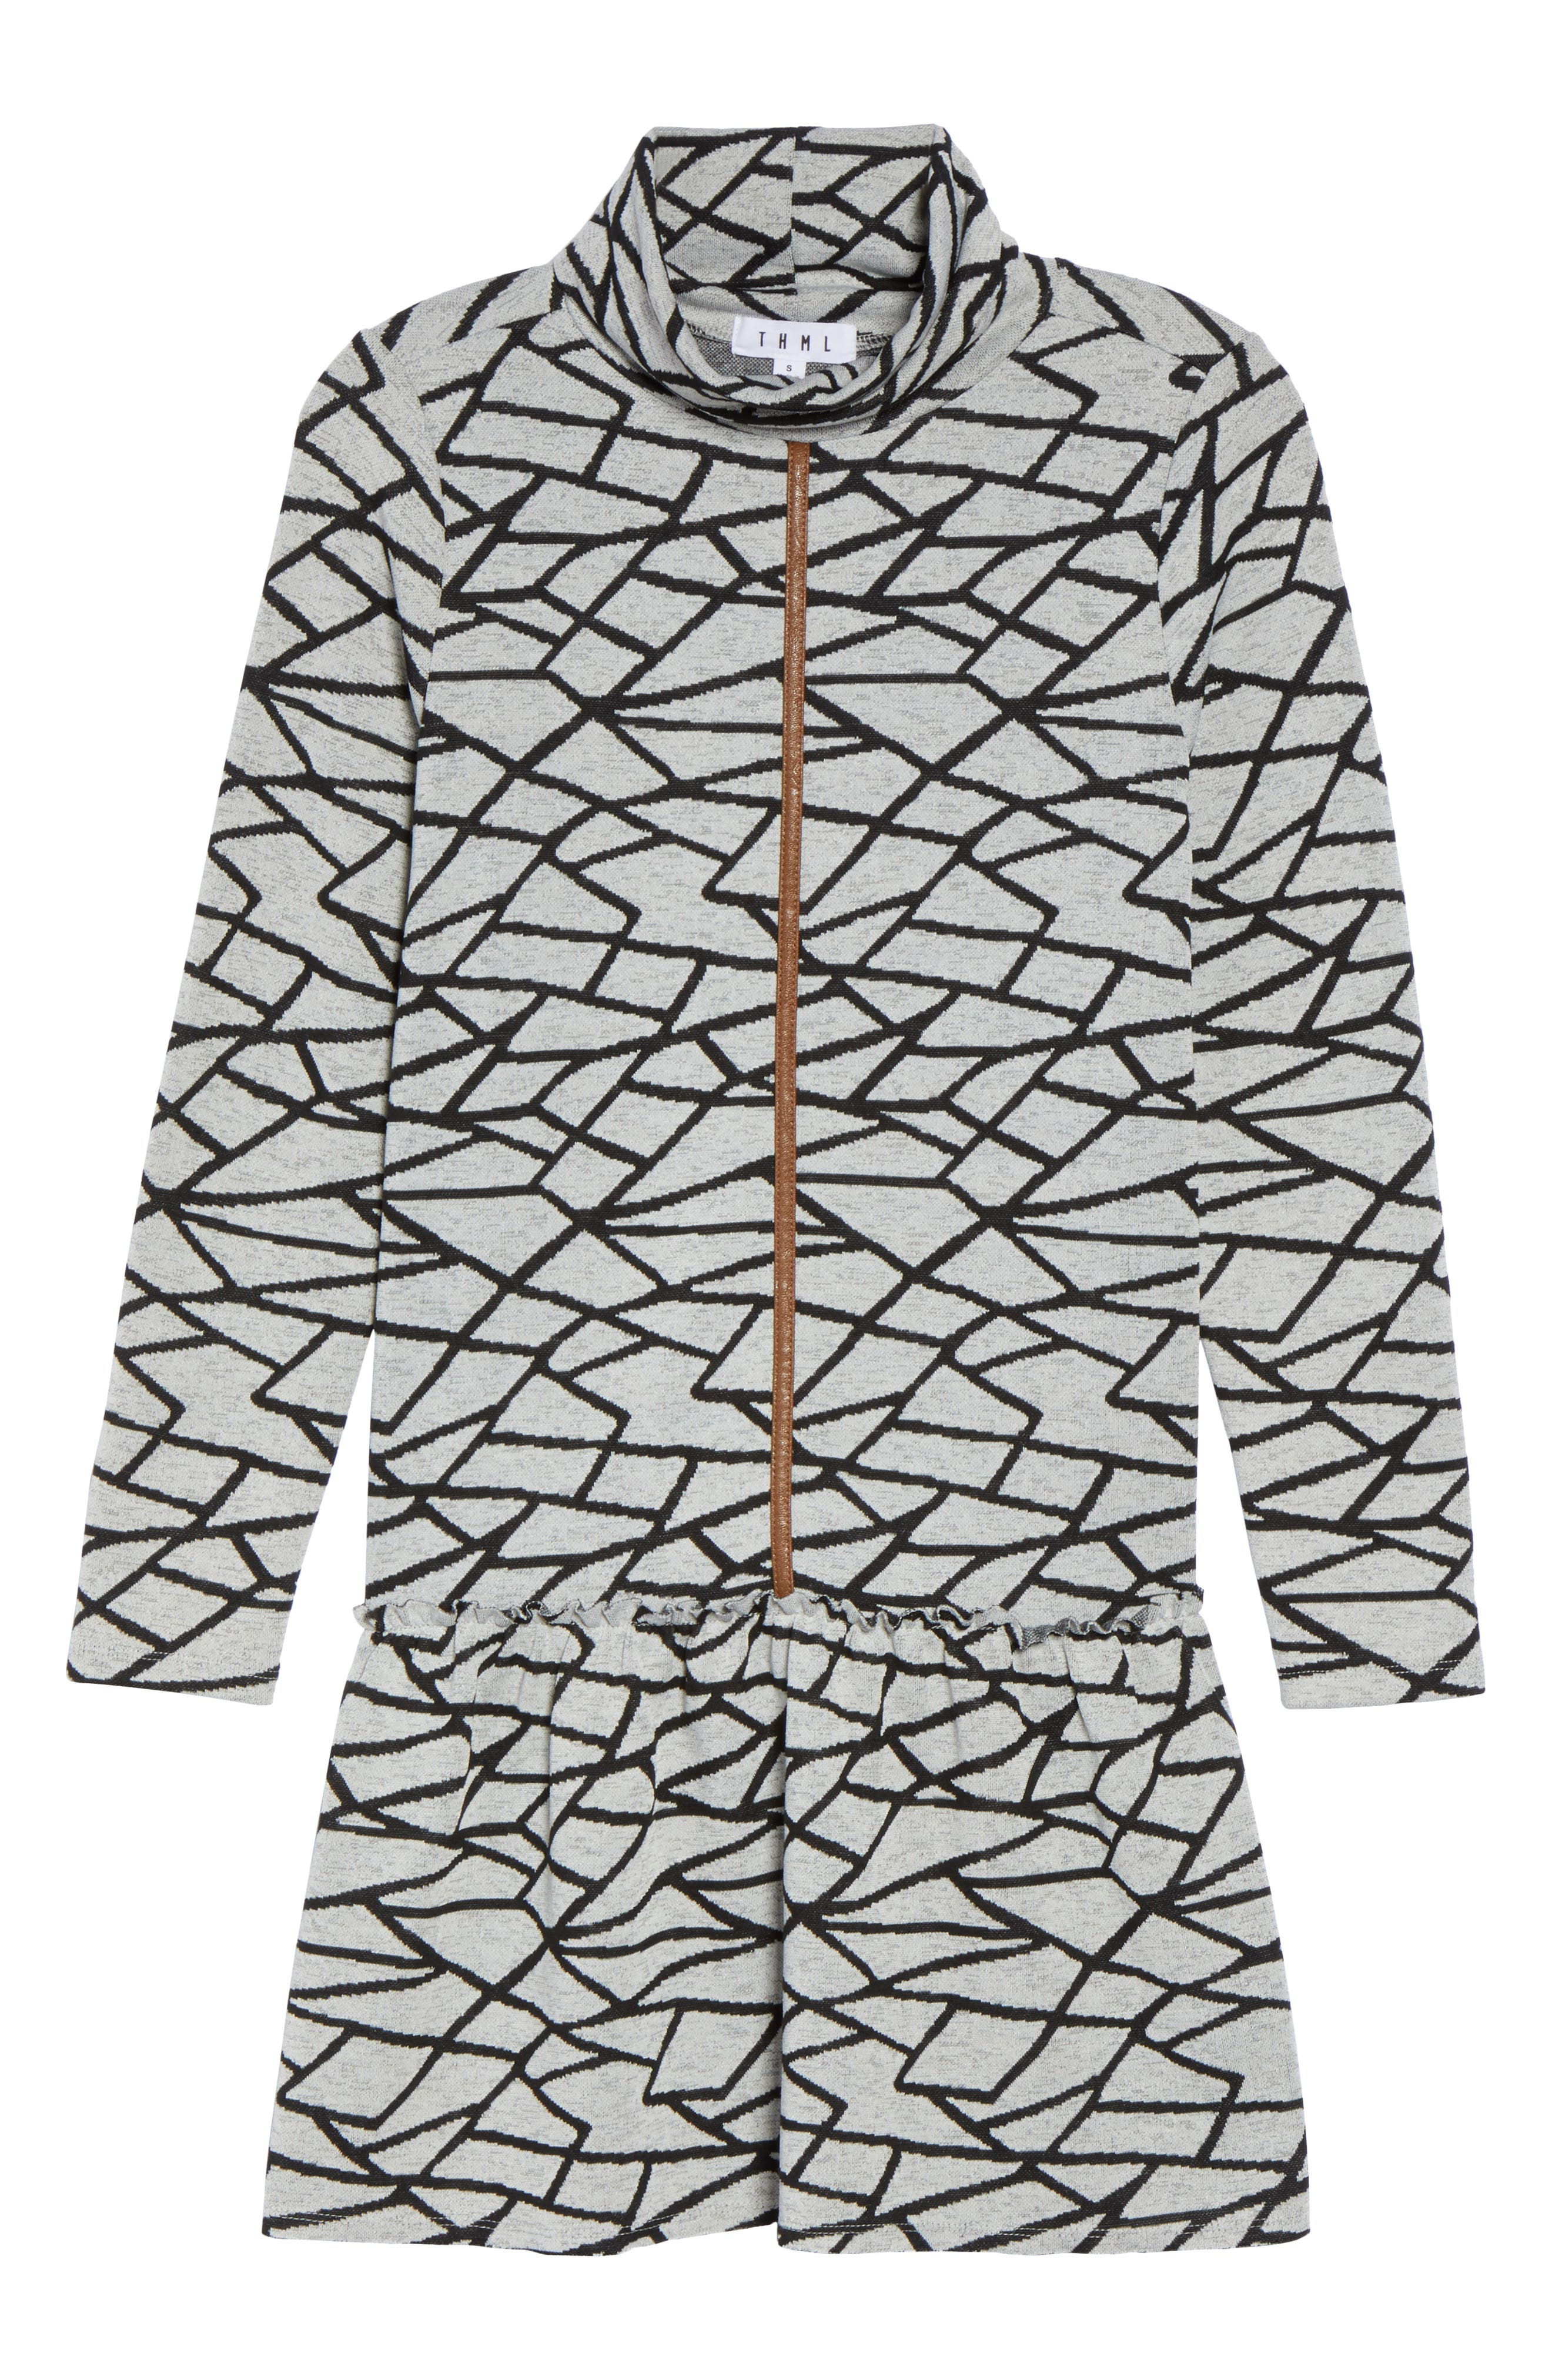 Turtleneck Sweater Dress,                             Alternate thumbnail 6, color,                             Black